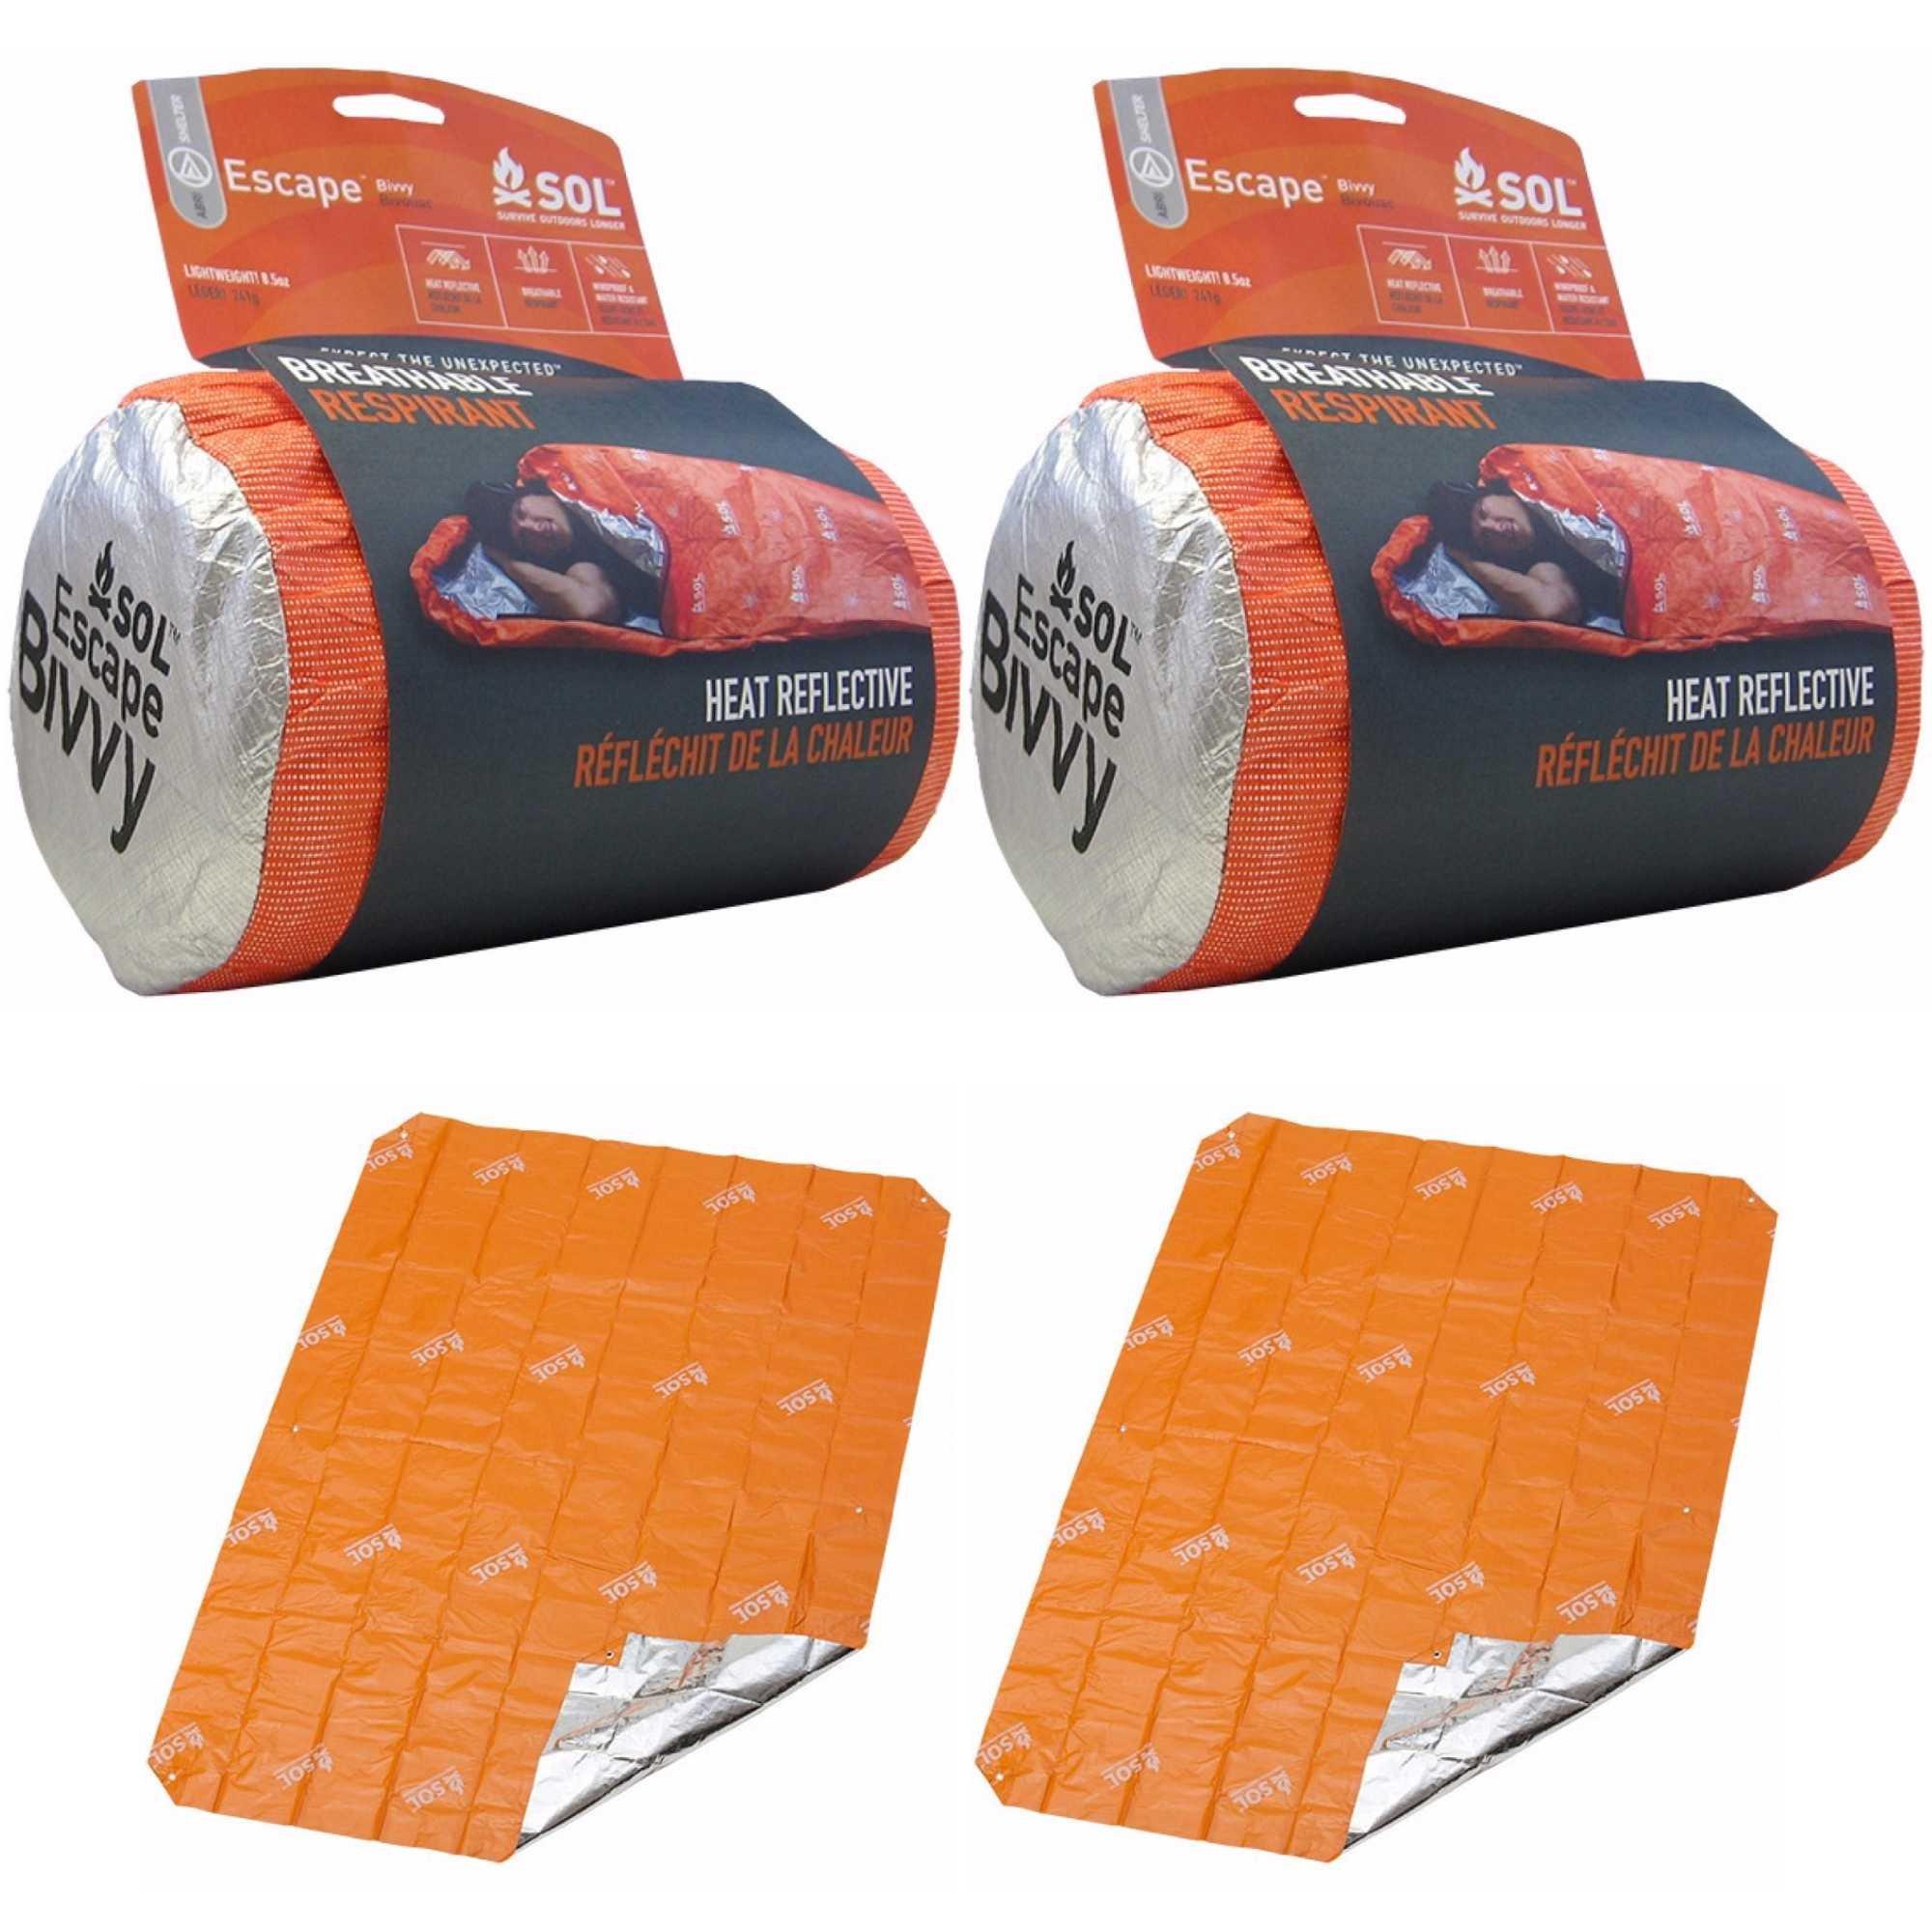 S.O.L. Survive Outdoors Longer 2x Escape Bivvy (Orange) & 2x SOL Sport Utility Blanket Shelter Kit for Two